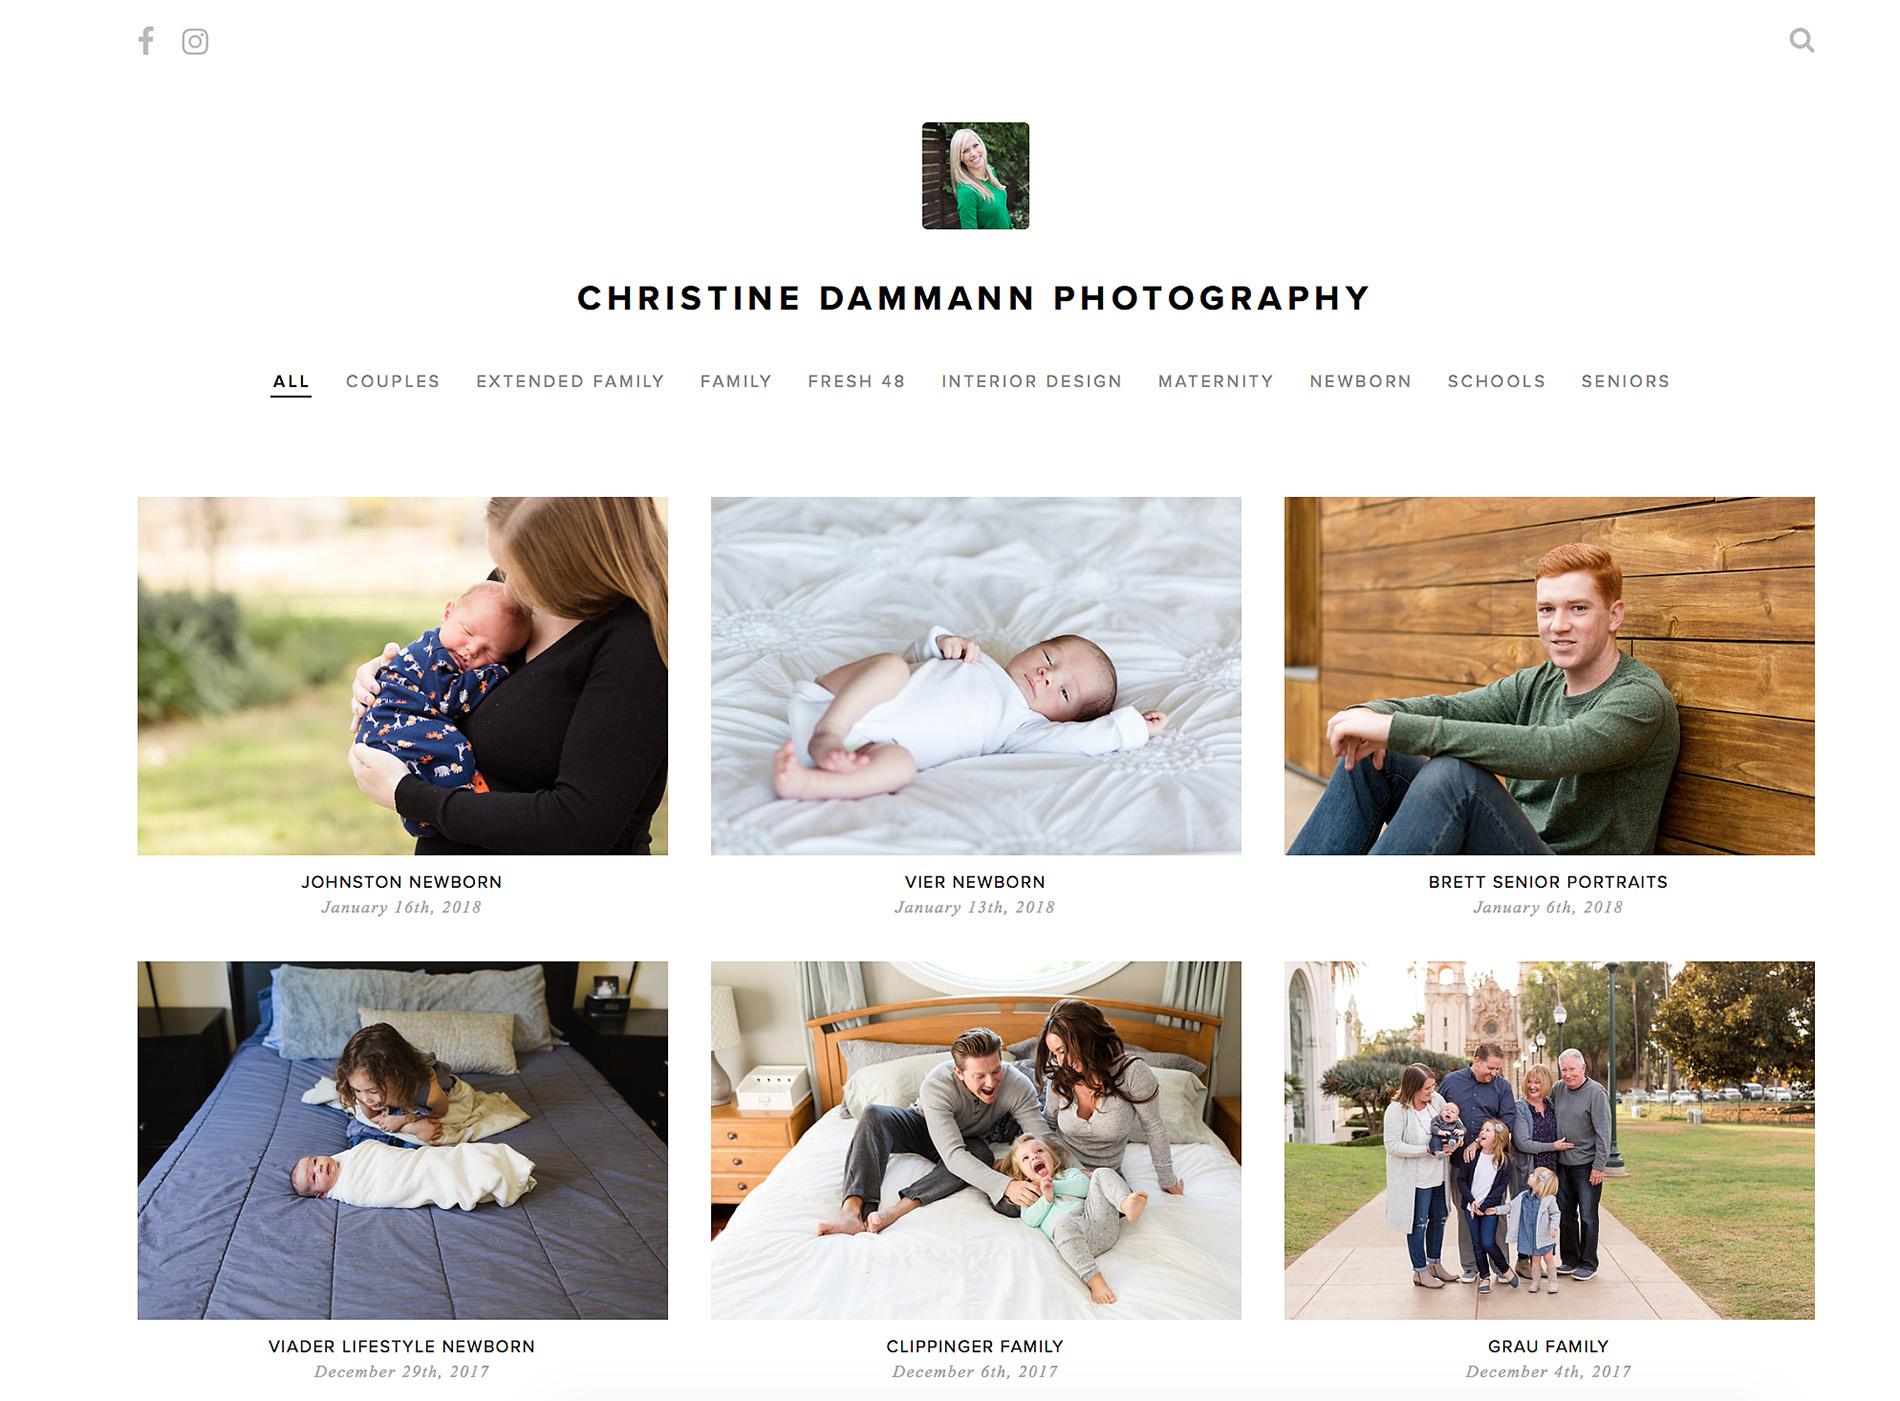 San Diego Family photographer tools that help my photography business Christine Dammann Photography Pixieset.jpg